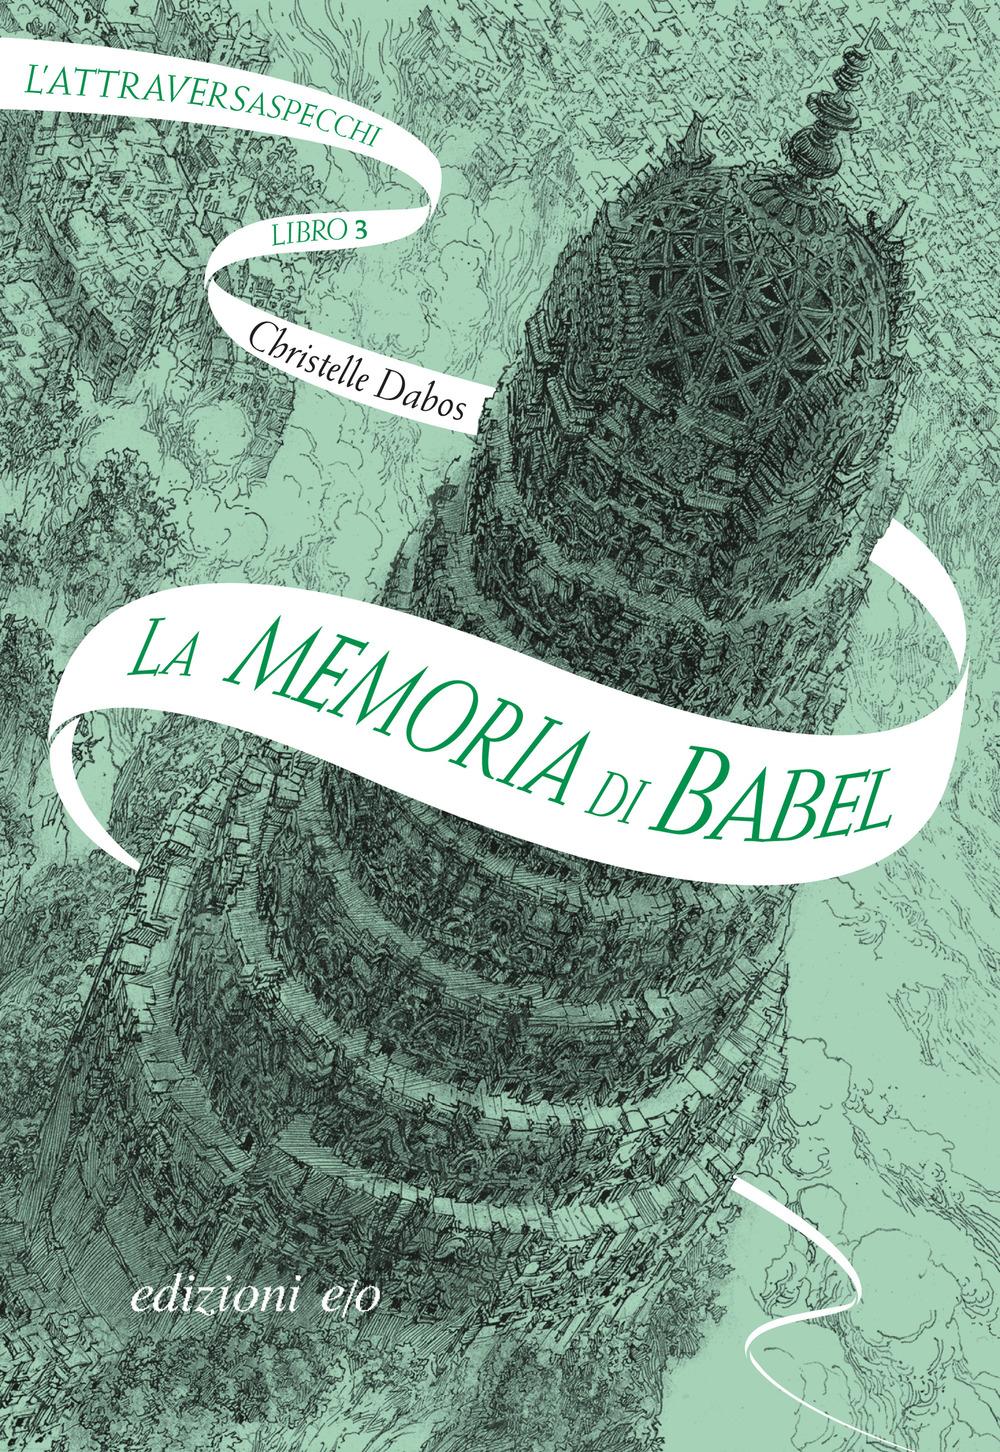 CHRISTELLE DABOS - LA MEMORIA DI BABEL